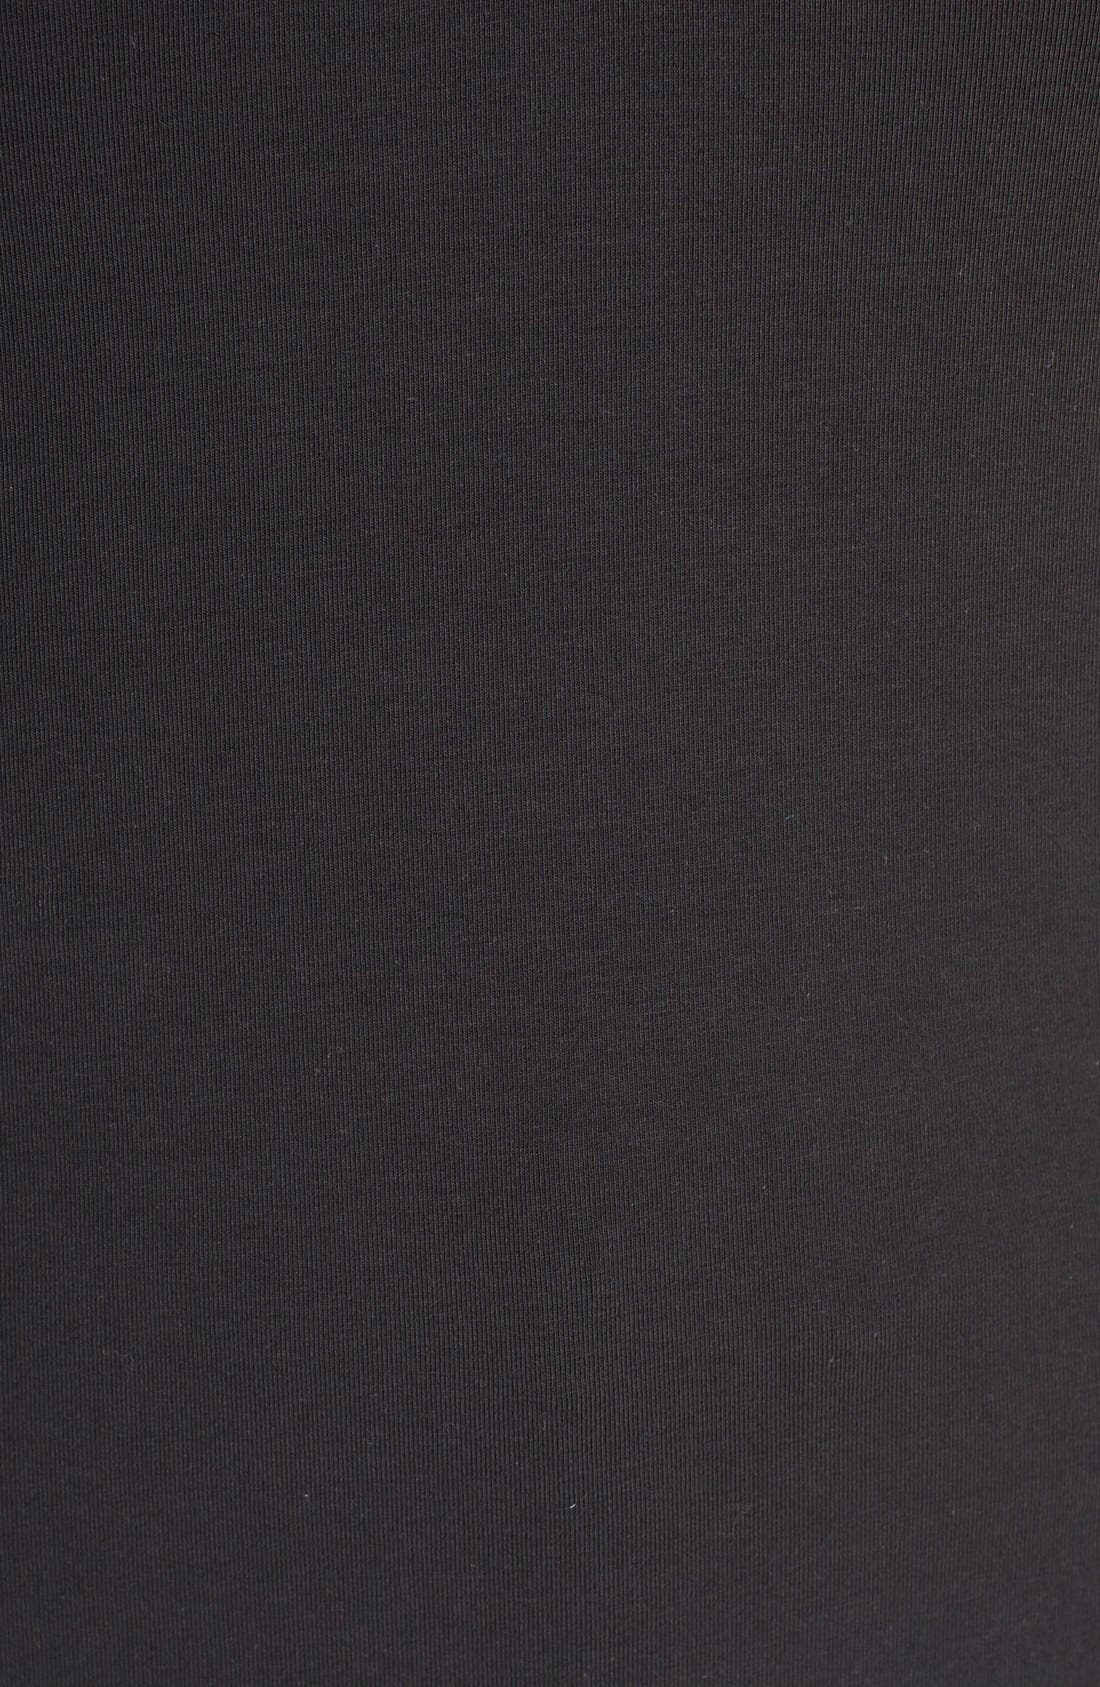 'Sweet Pleat' Sleeveless Top,                             Alternate thumbnail 5, color,                             Black Onyx